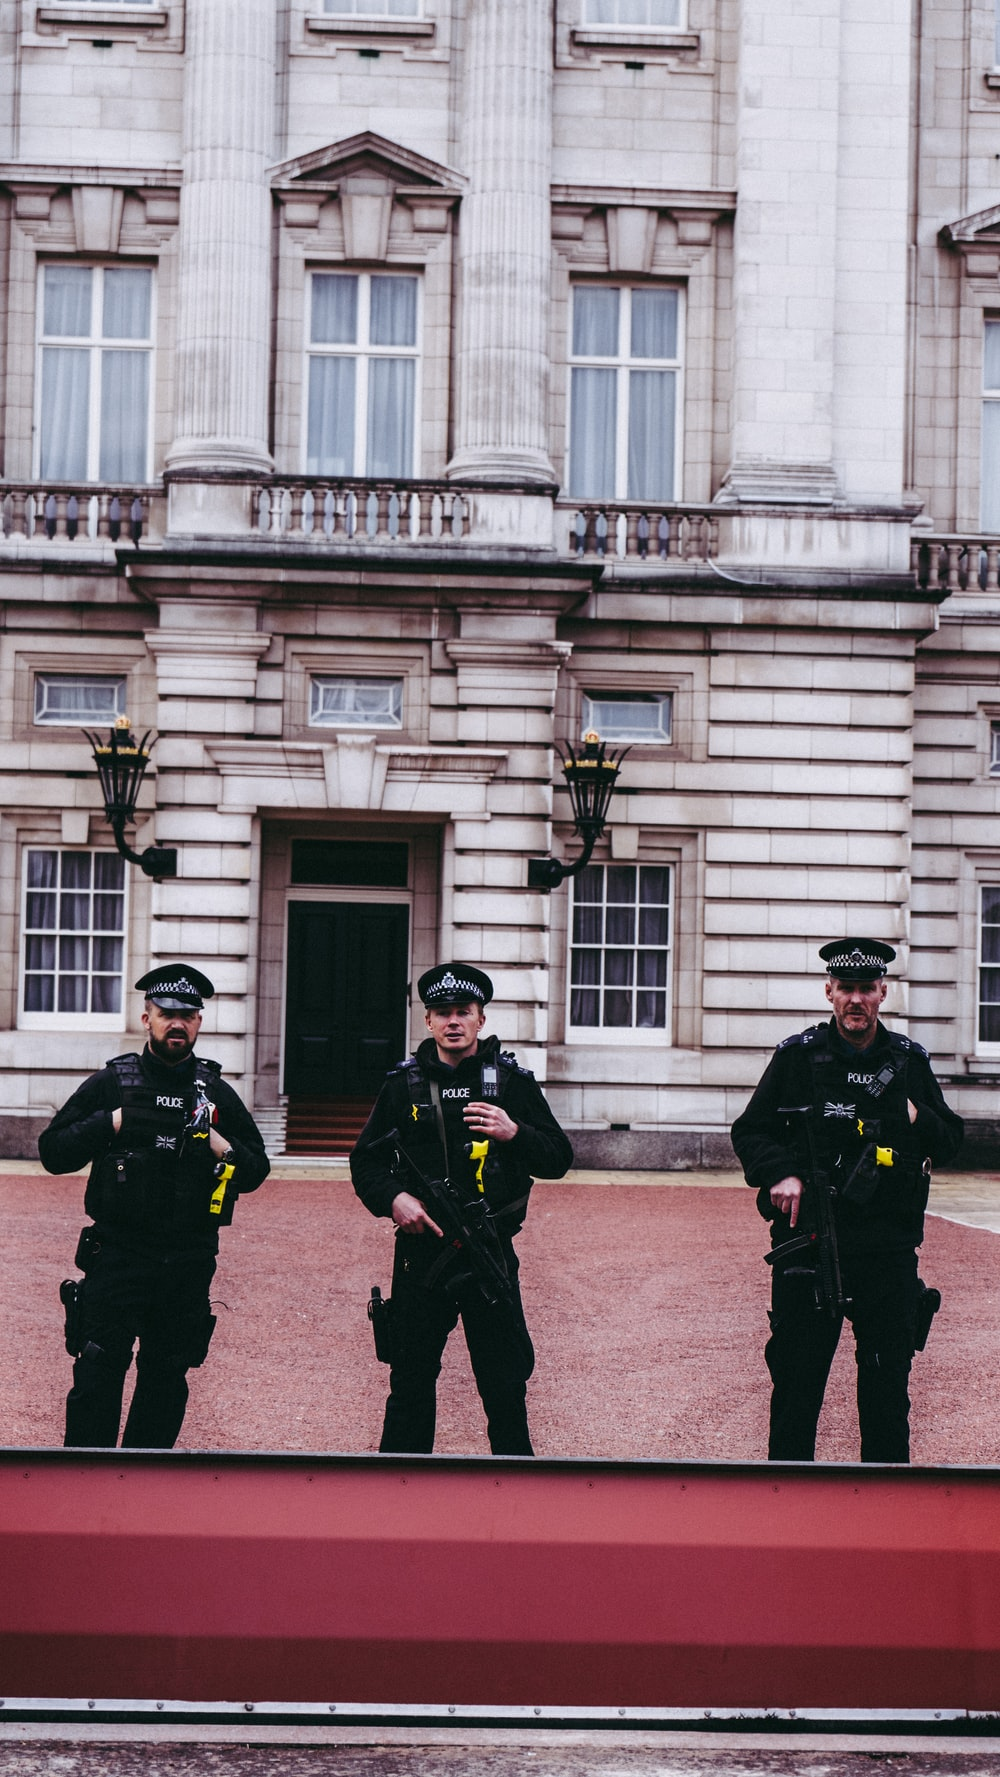 three police men standing in front of building